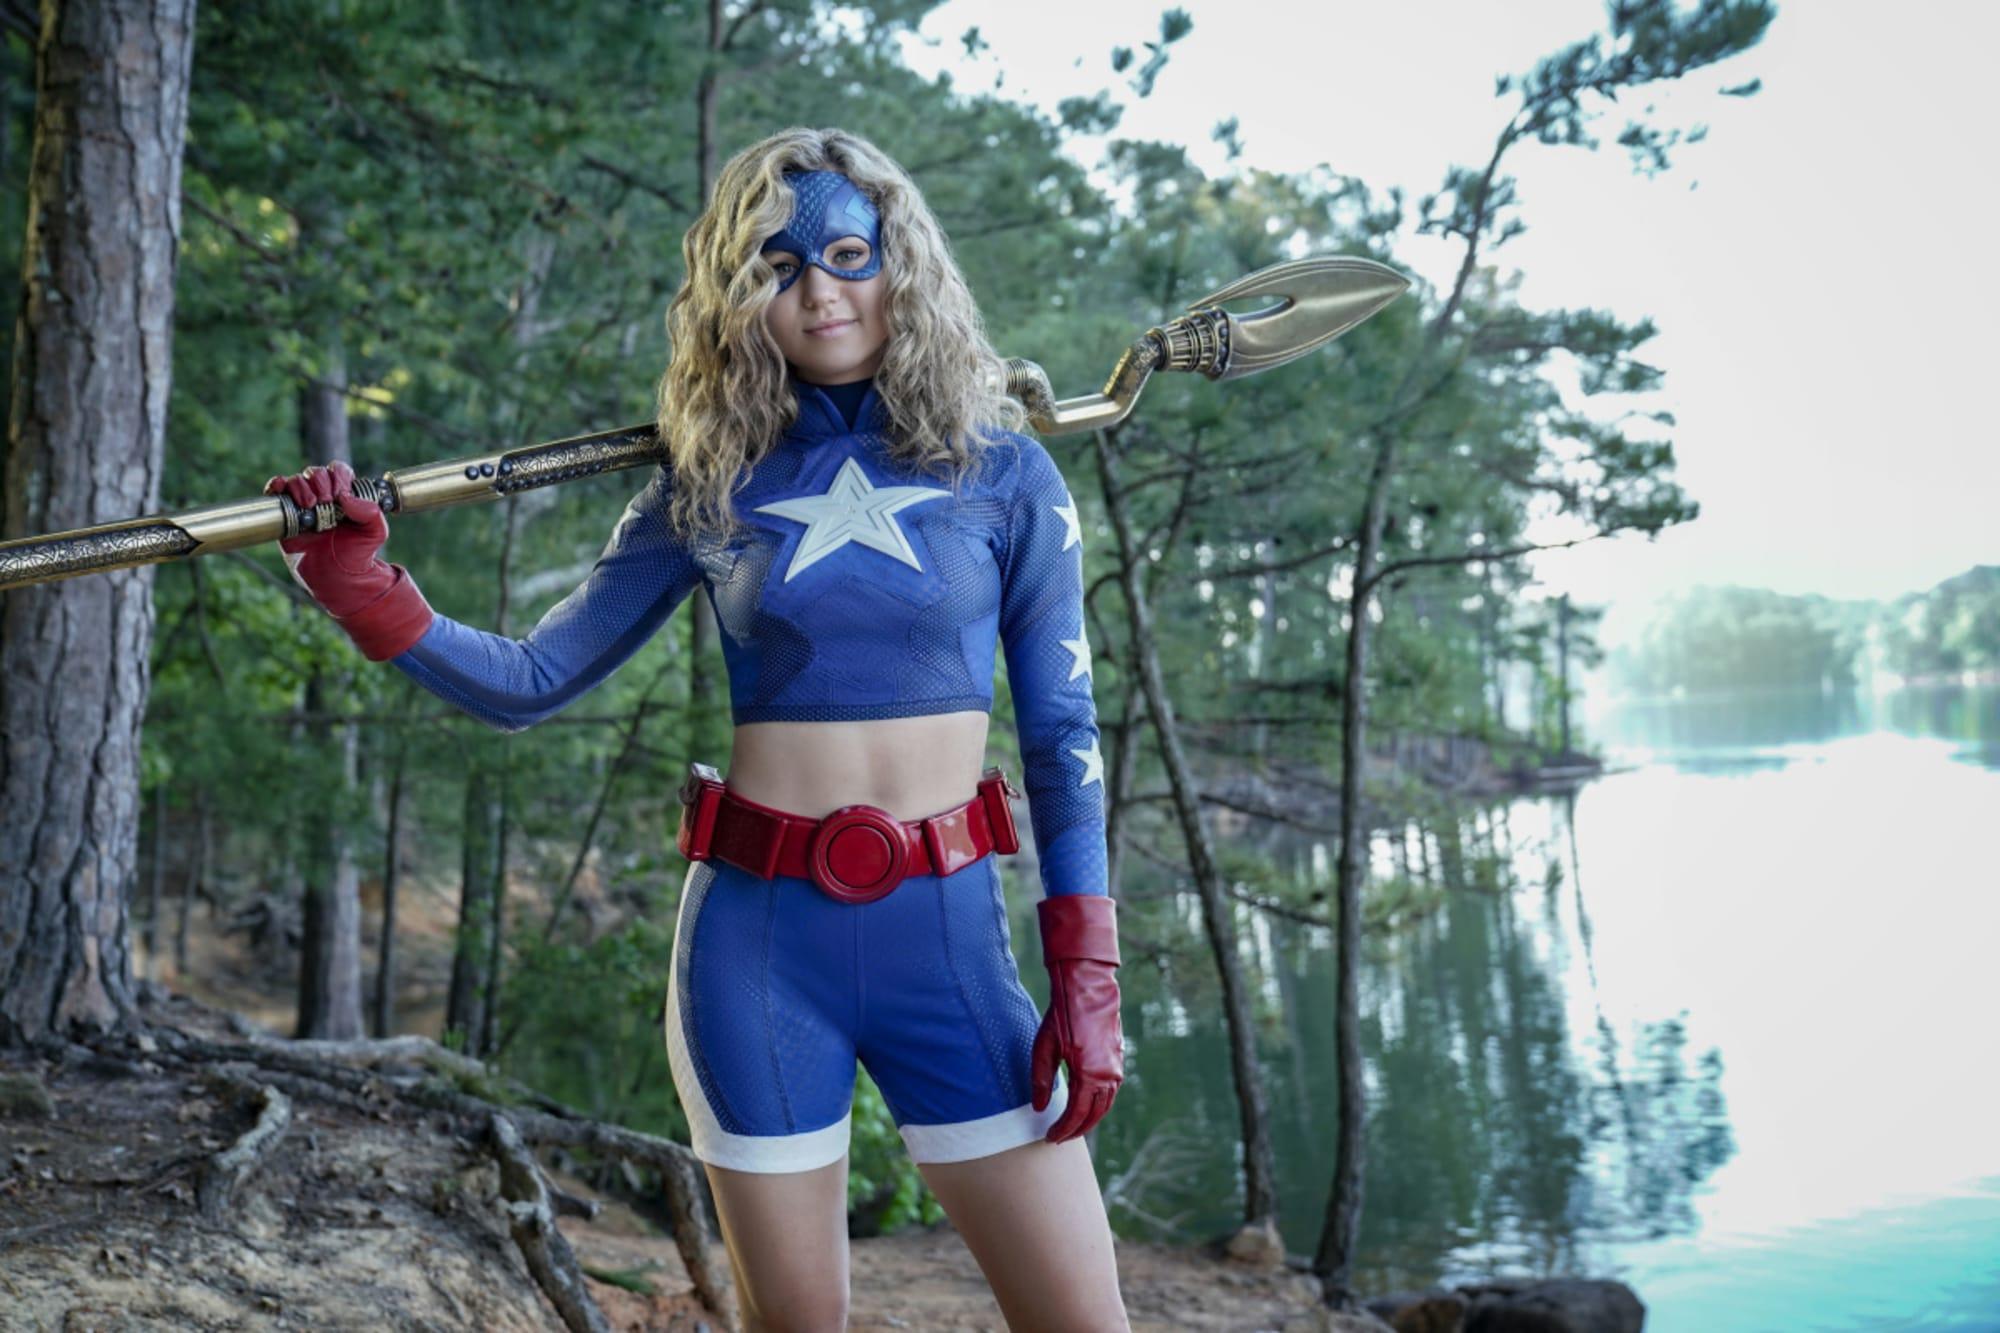 5 reasons you should be watching DC's Stargirl